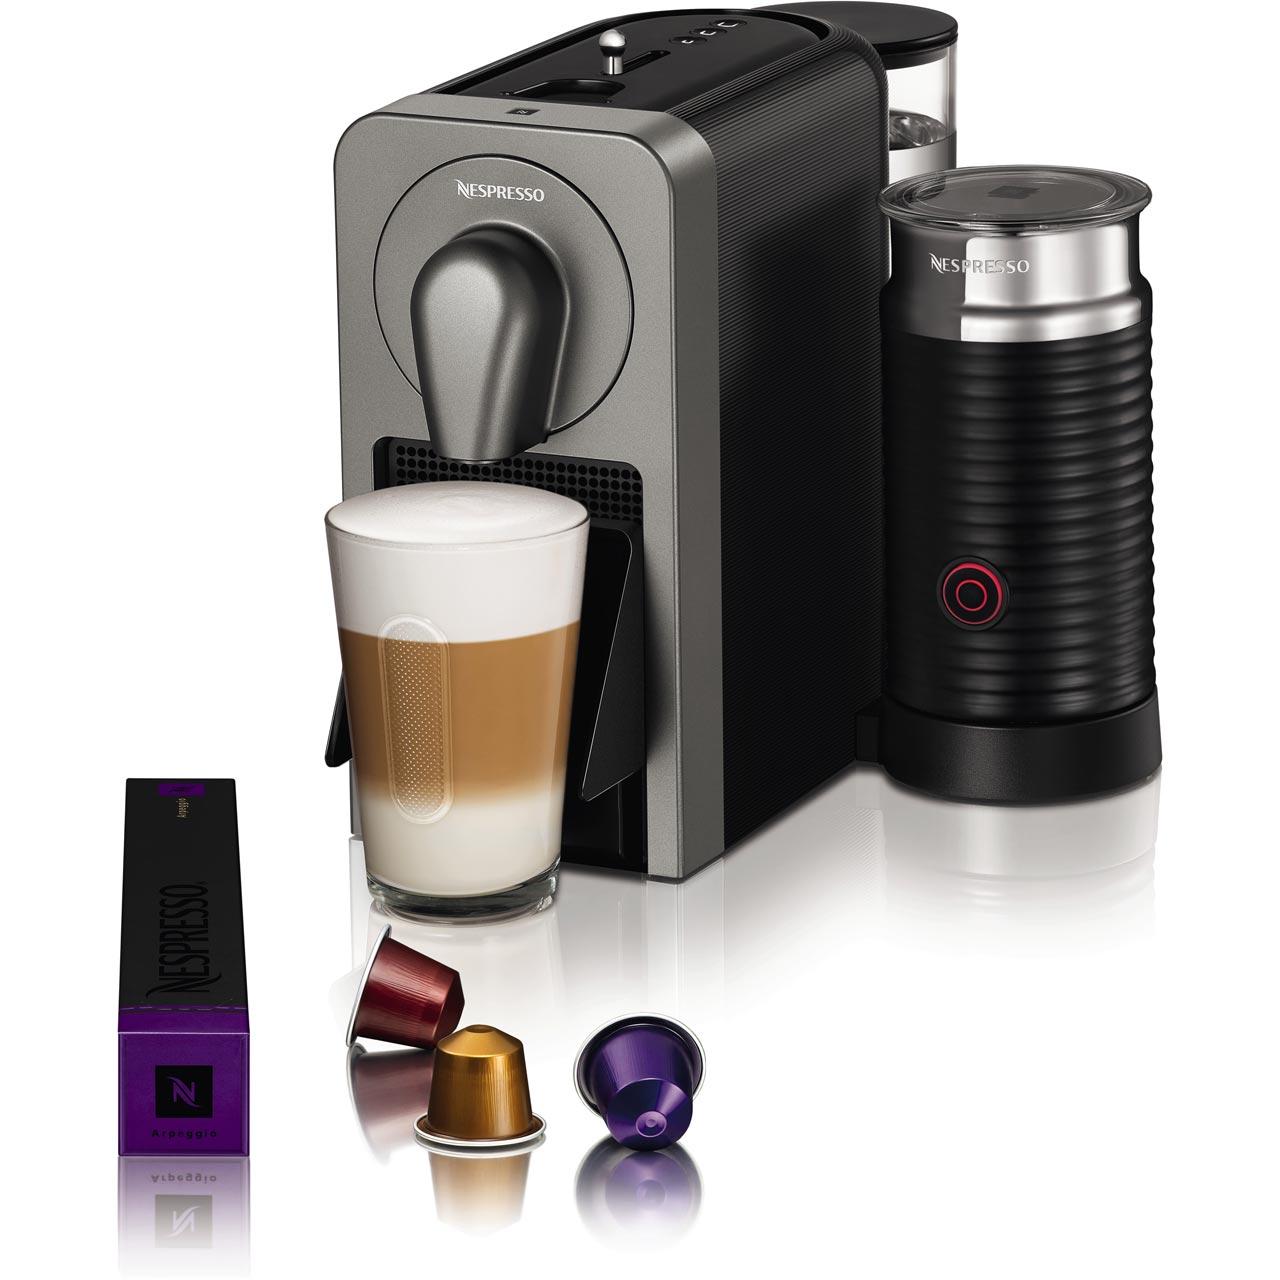 Senseo Coffee Maker Flashing Red Light : Nespresso Machine Two Flashing Lights Iron Blog